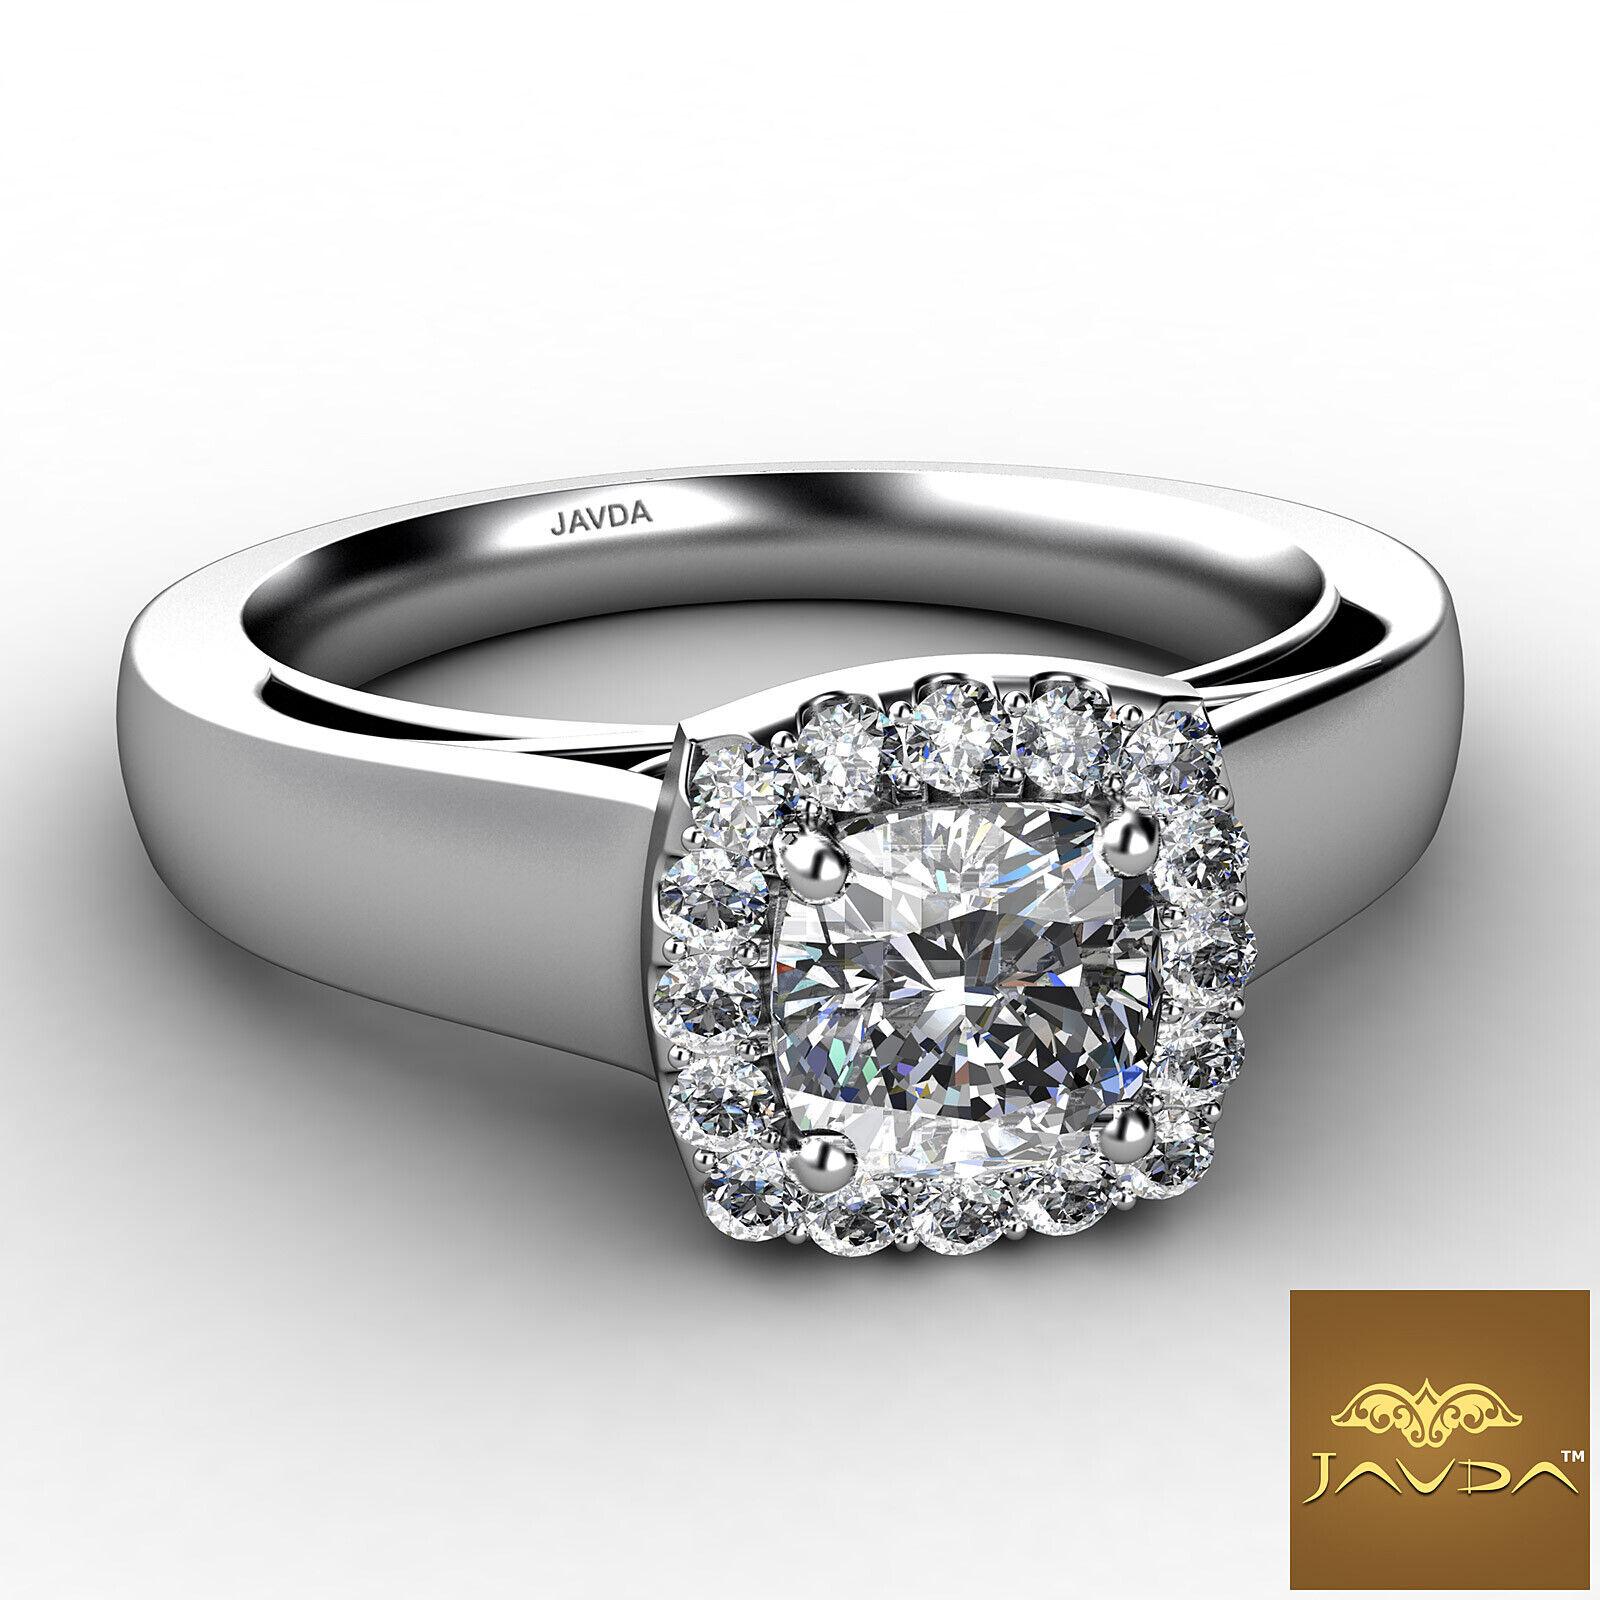 Filigree Shank U Cut Prong Cushion Diamond Engagement GIA H Color VS1 Ring 0.7Ct 1